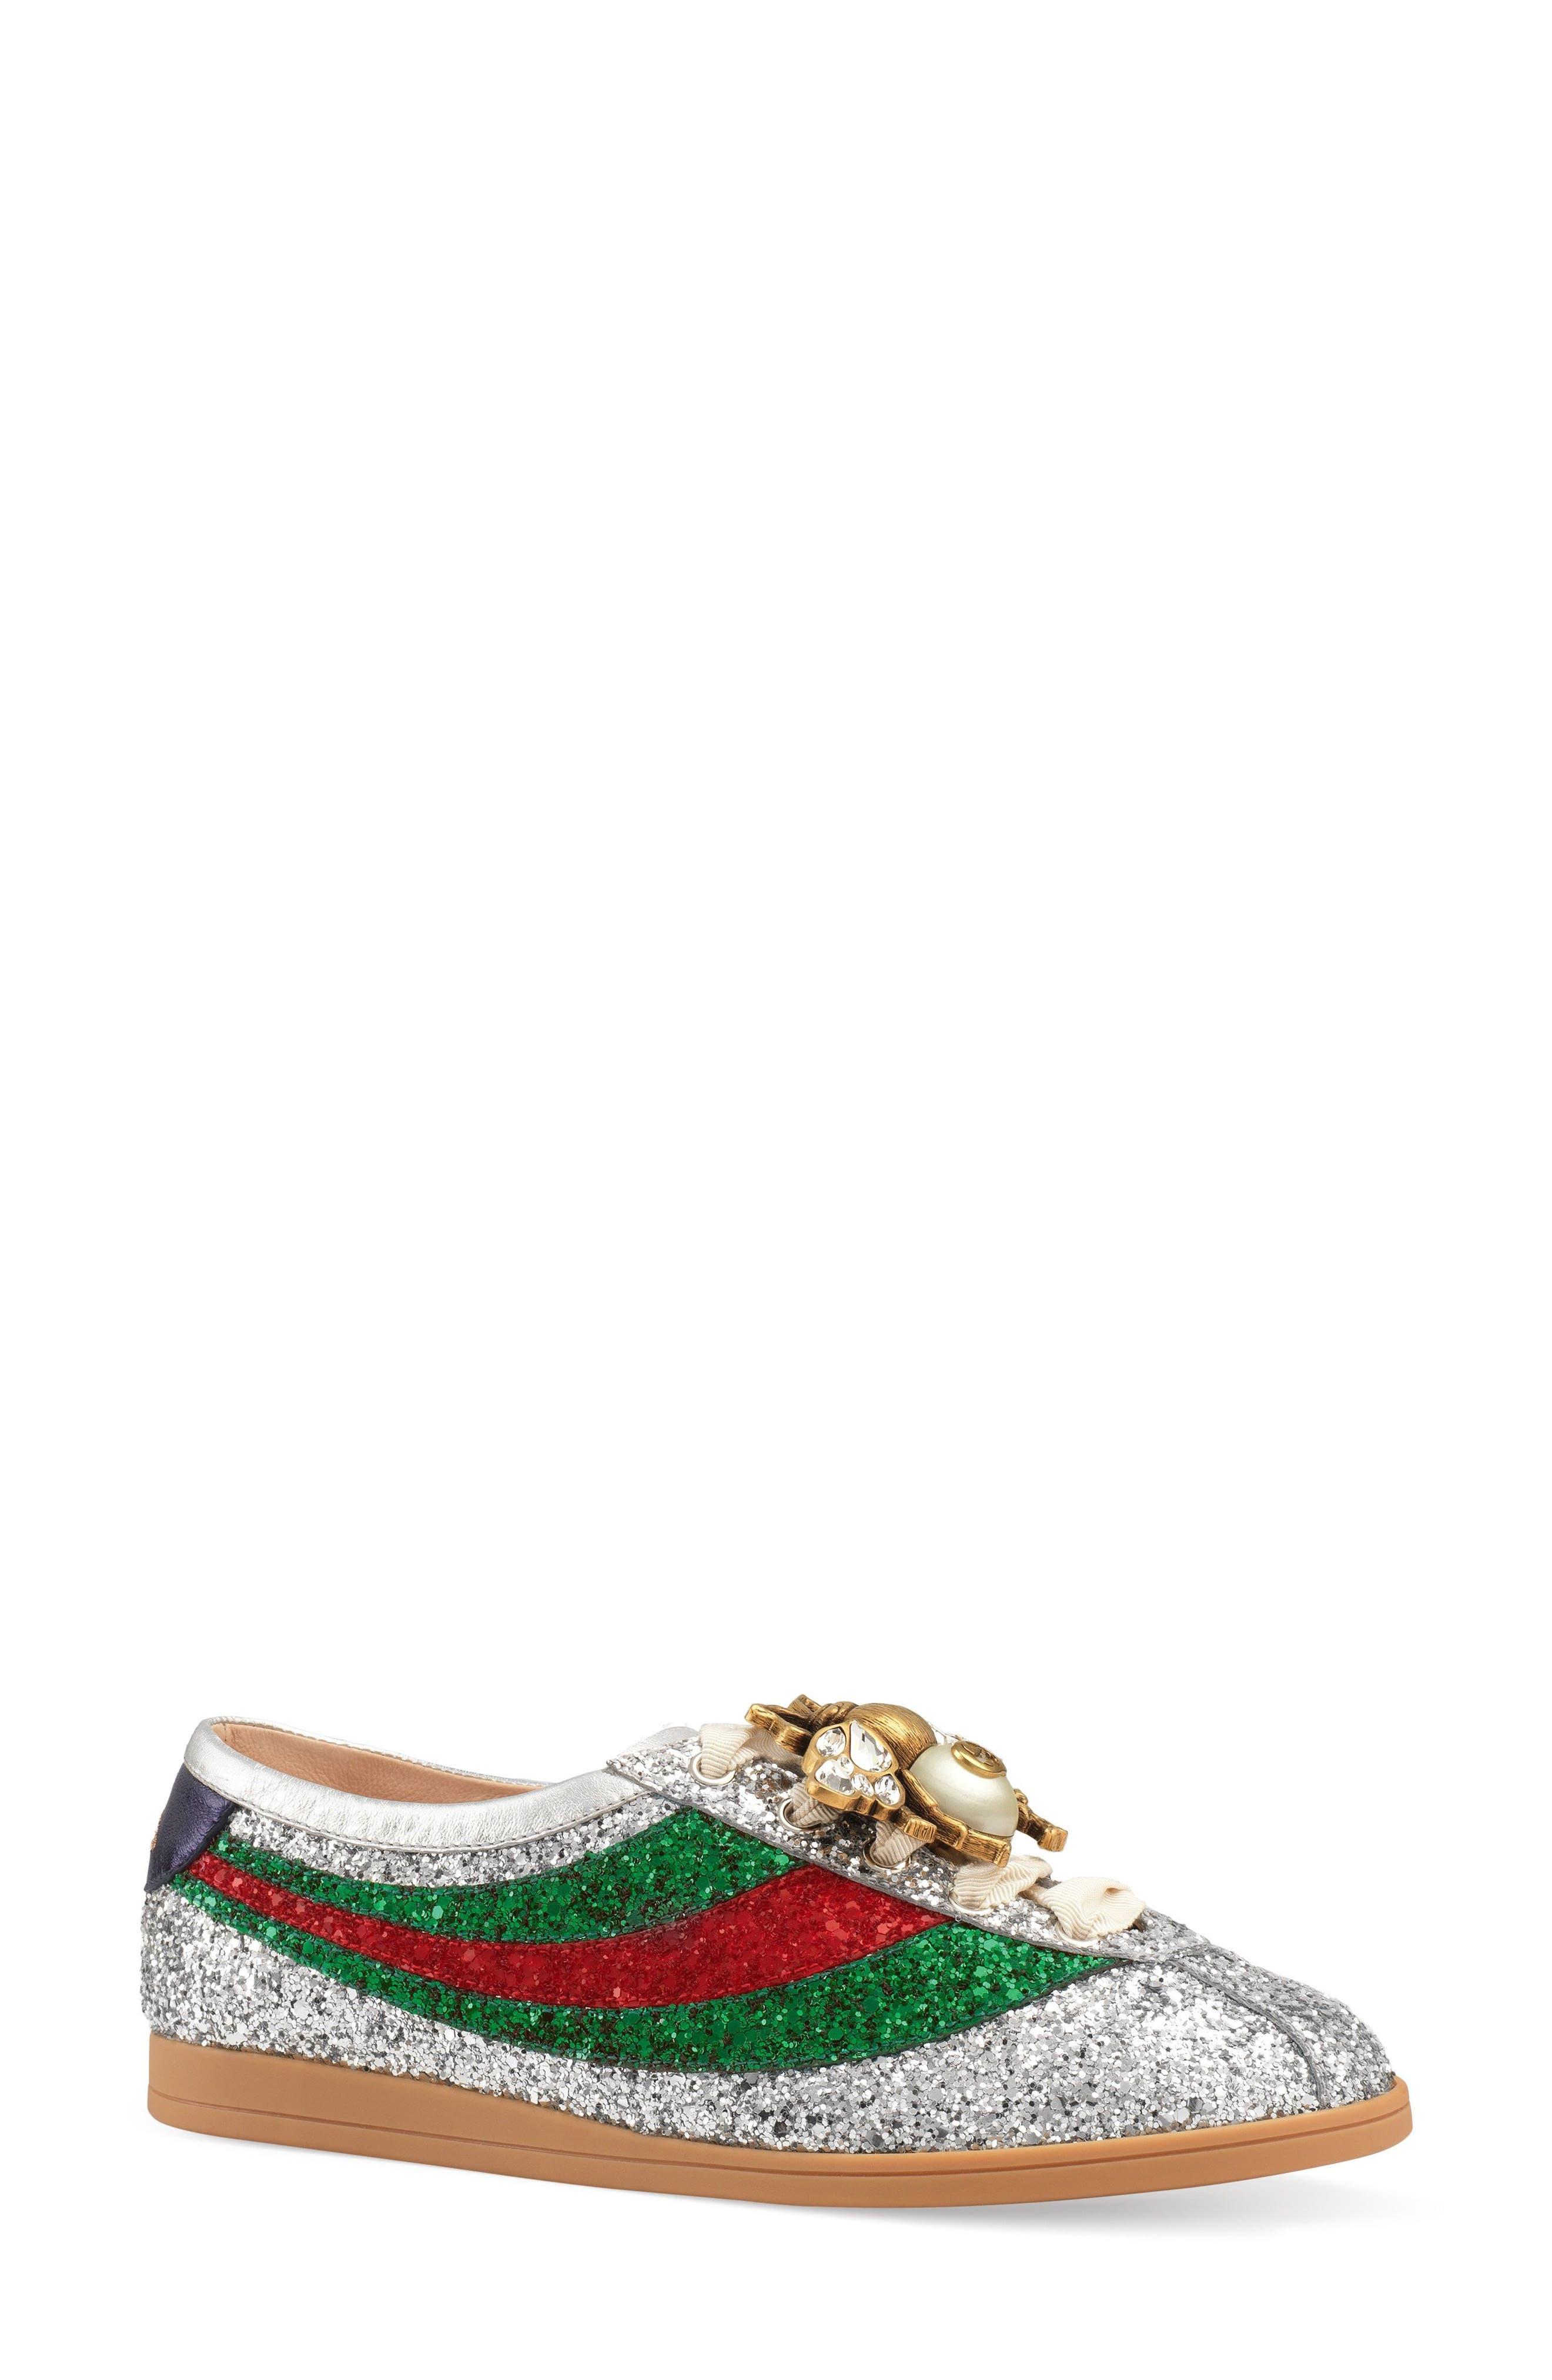 Womens Falacer Glitter Sneakers Gucci QvjlpM9v